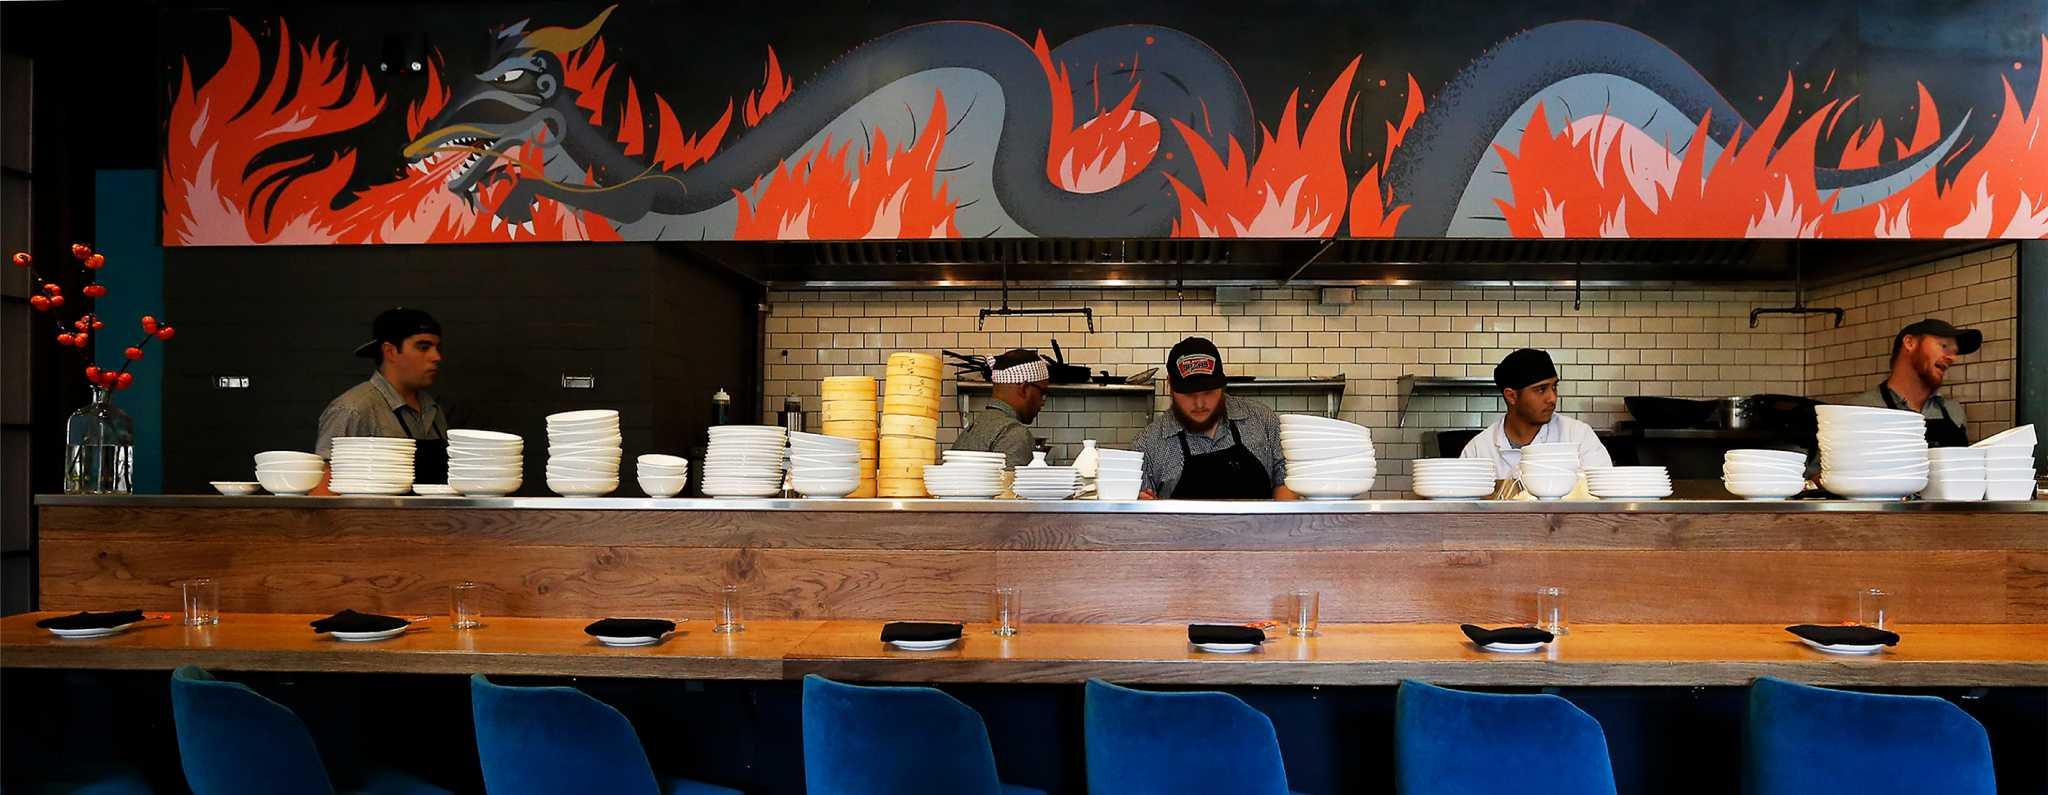 Botika opens for lunch beginning tomorrow - San Antonio Express-News